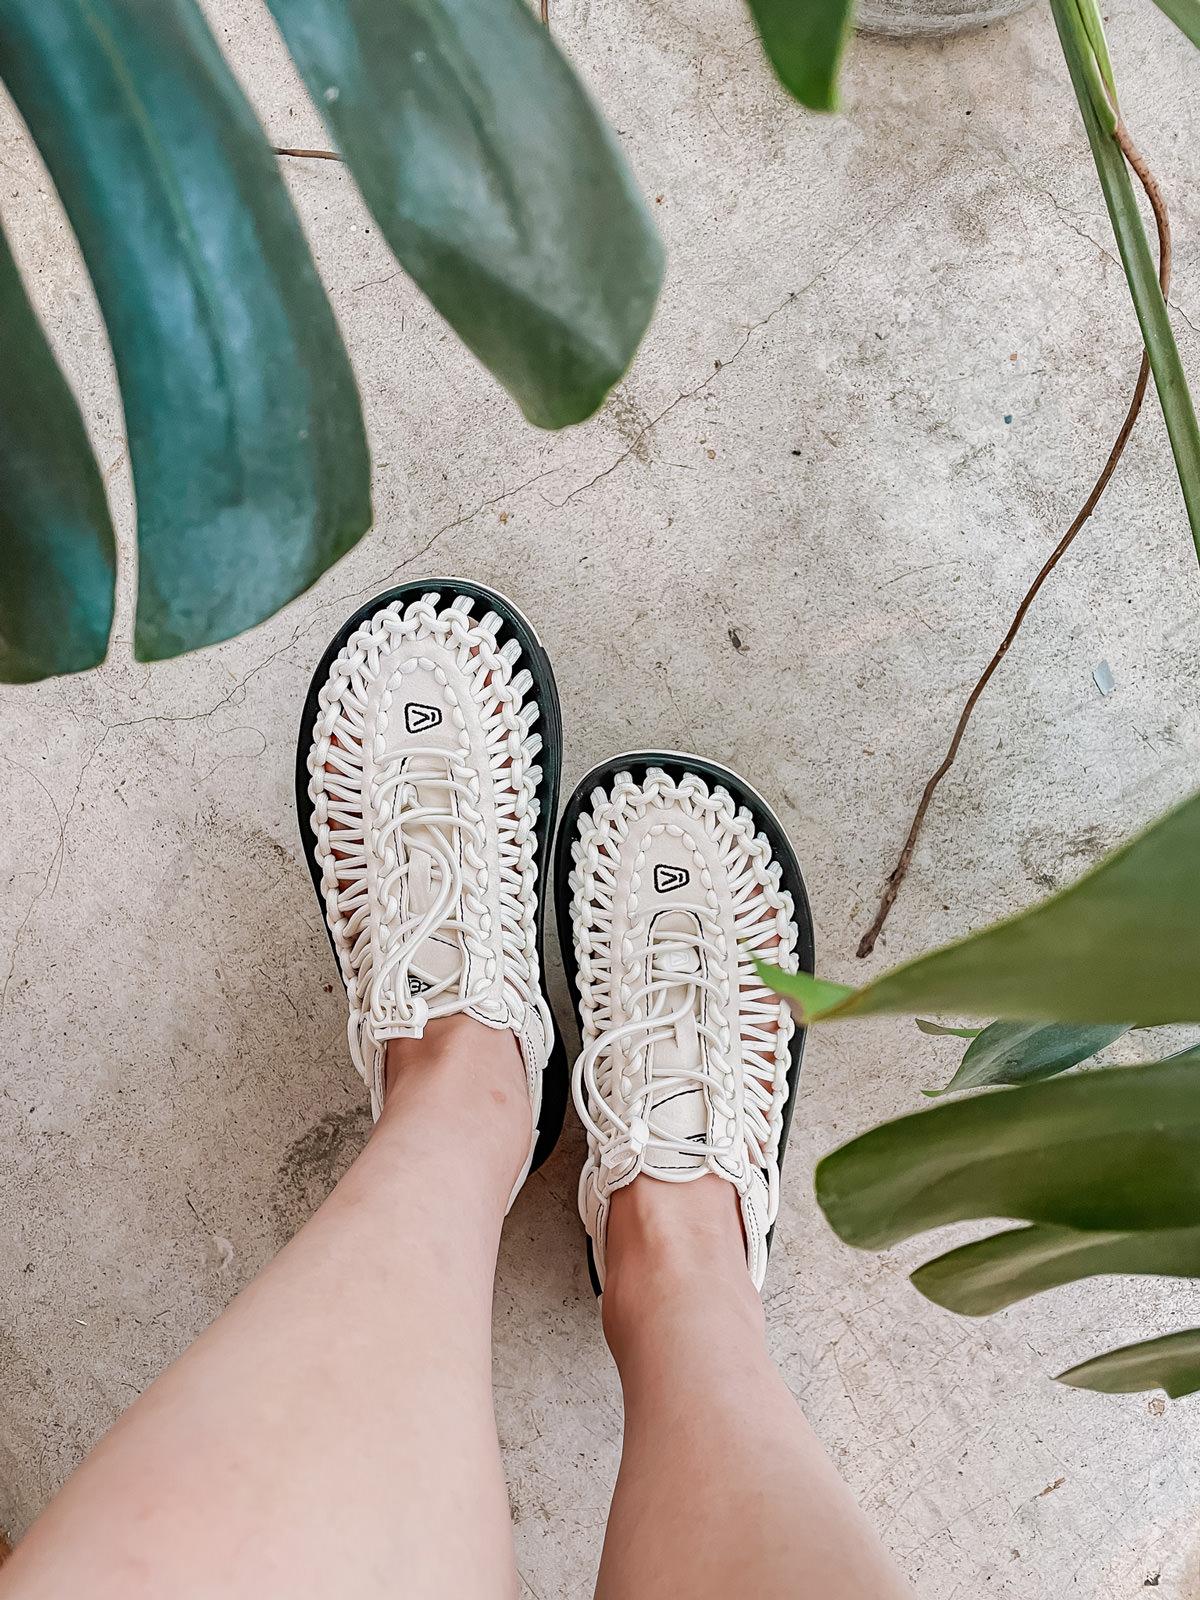 Loobook ∎ 文青風格 KEEN Uneek Sandals入手!屬於小個子女生Uneek日常穿搭分享